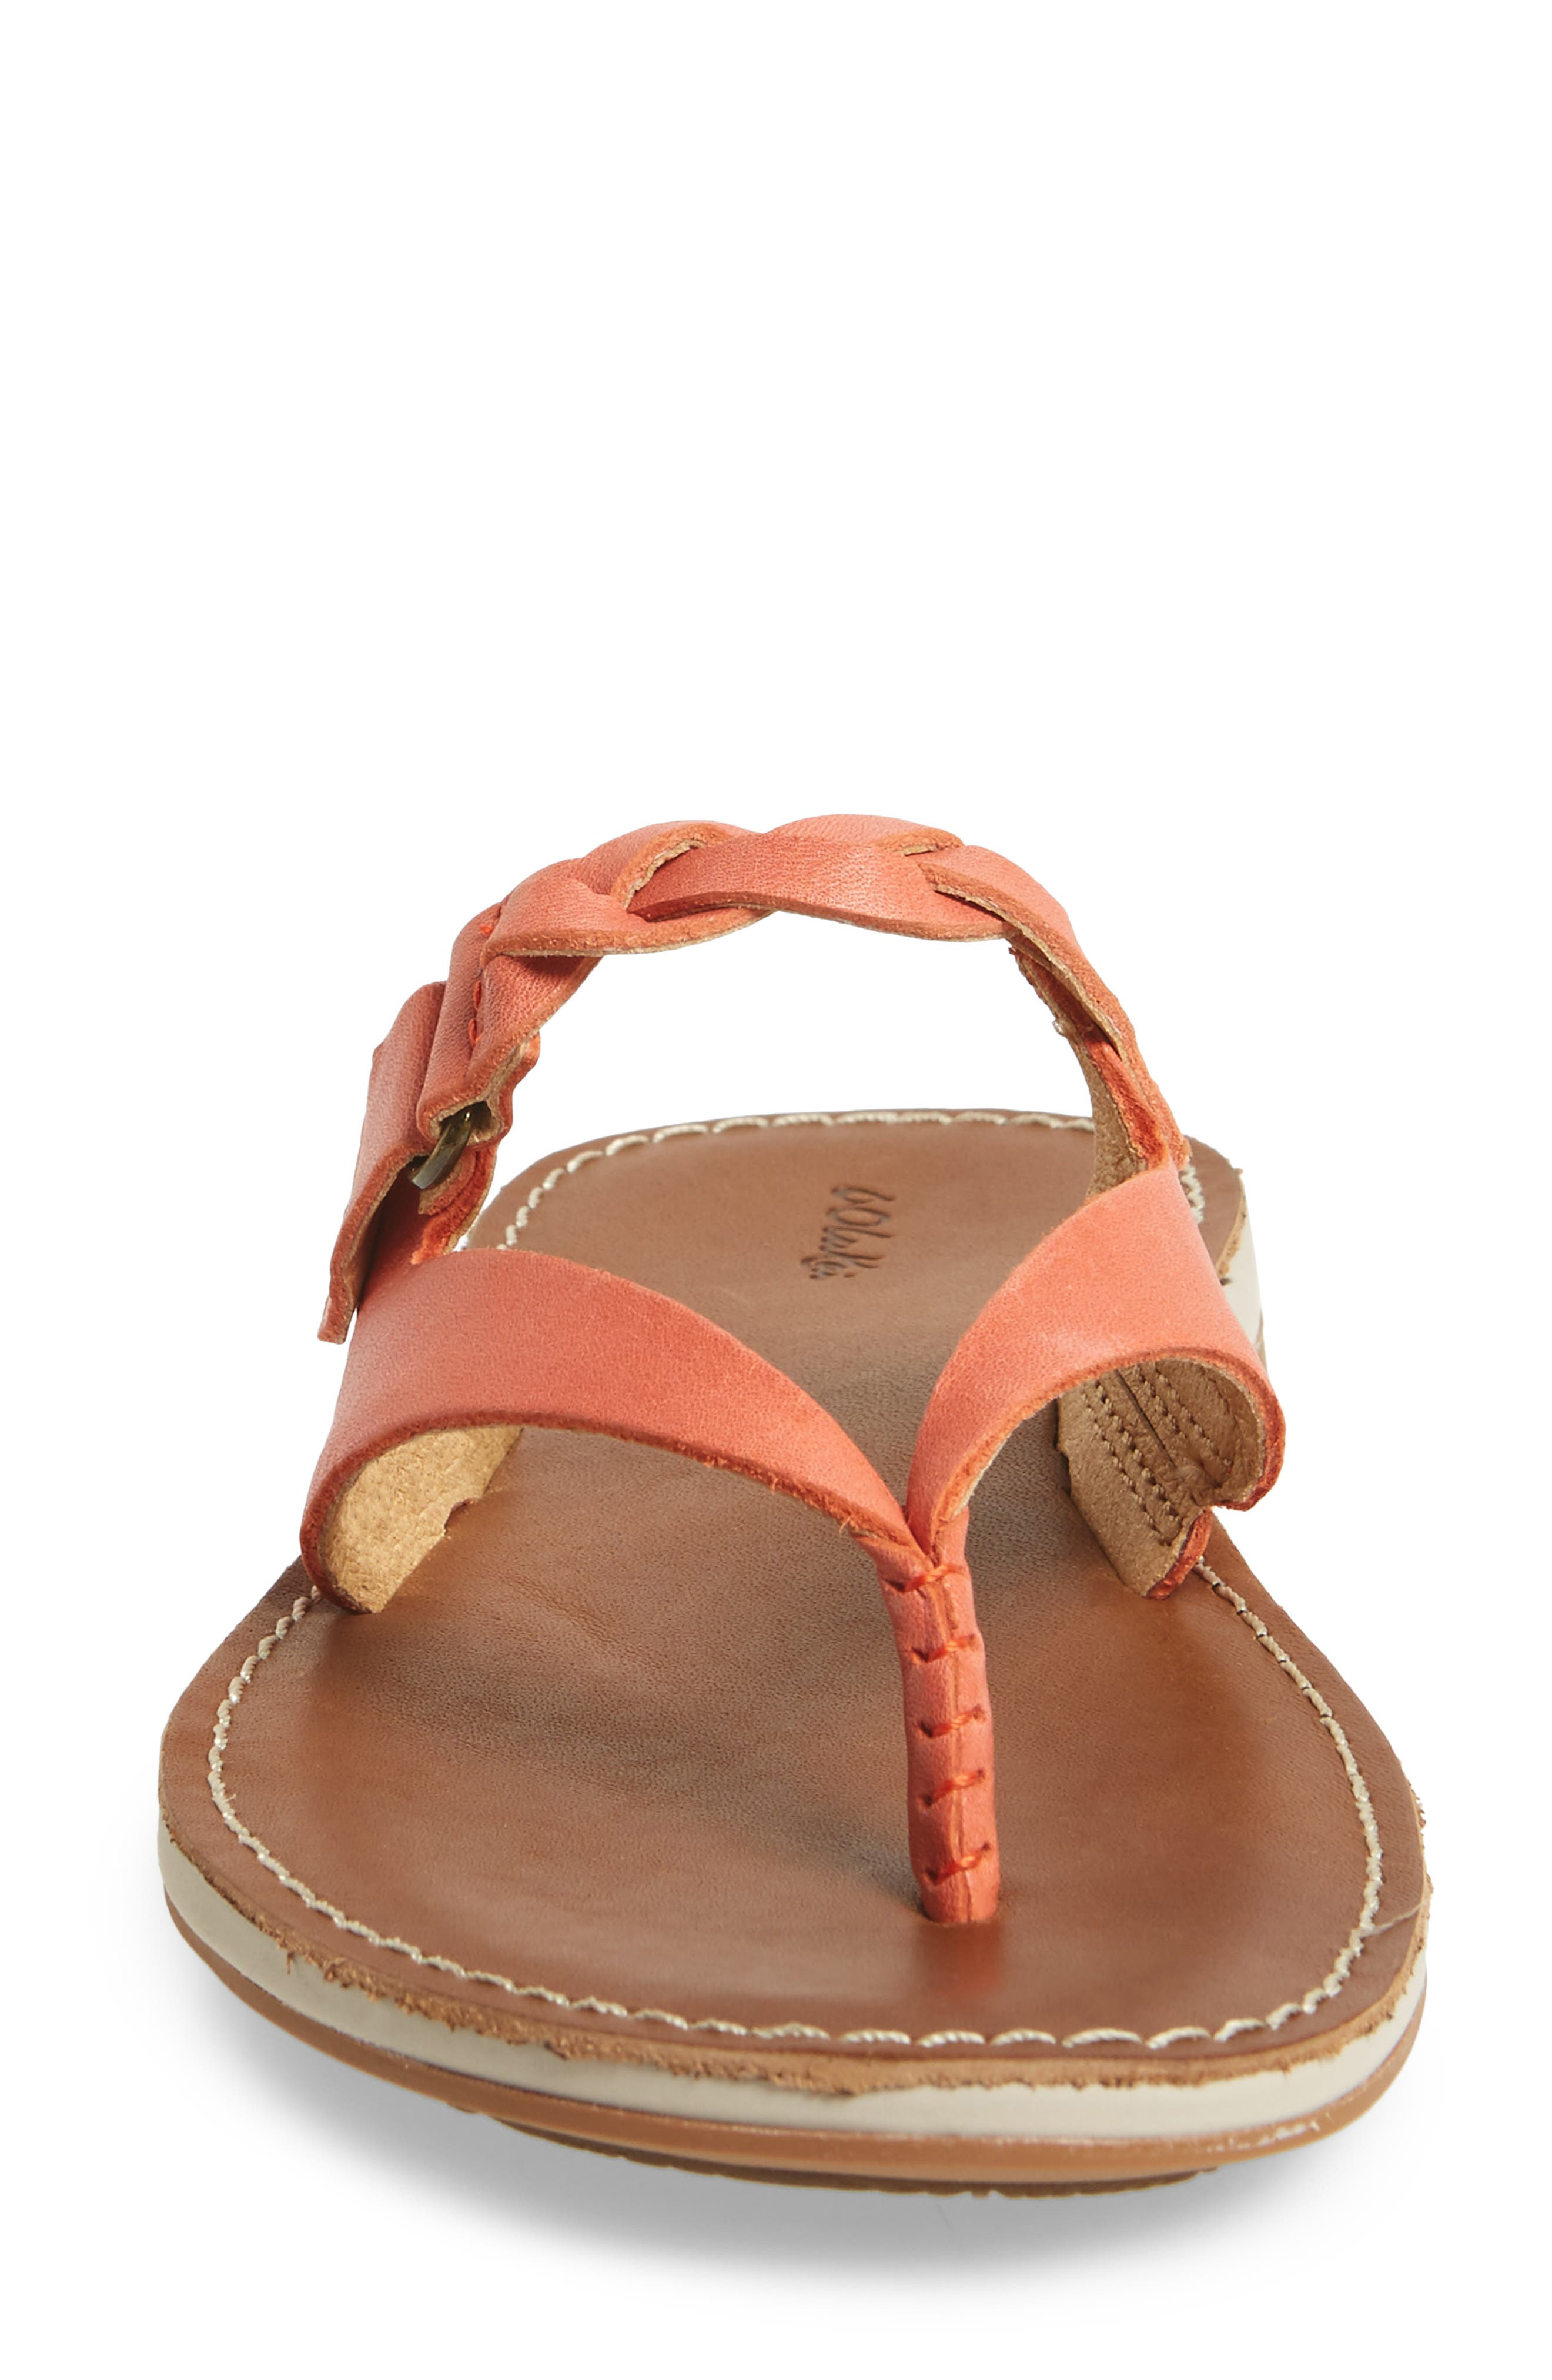 Kahikolu Flip Flop,                             Alternate thumbnail 4, color,                             Peach/ Tan Leather